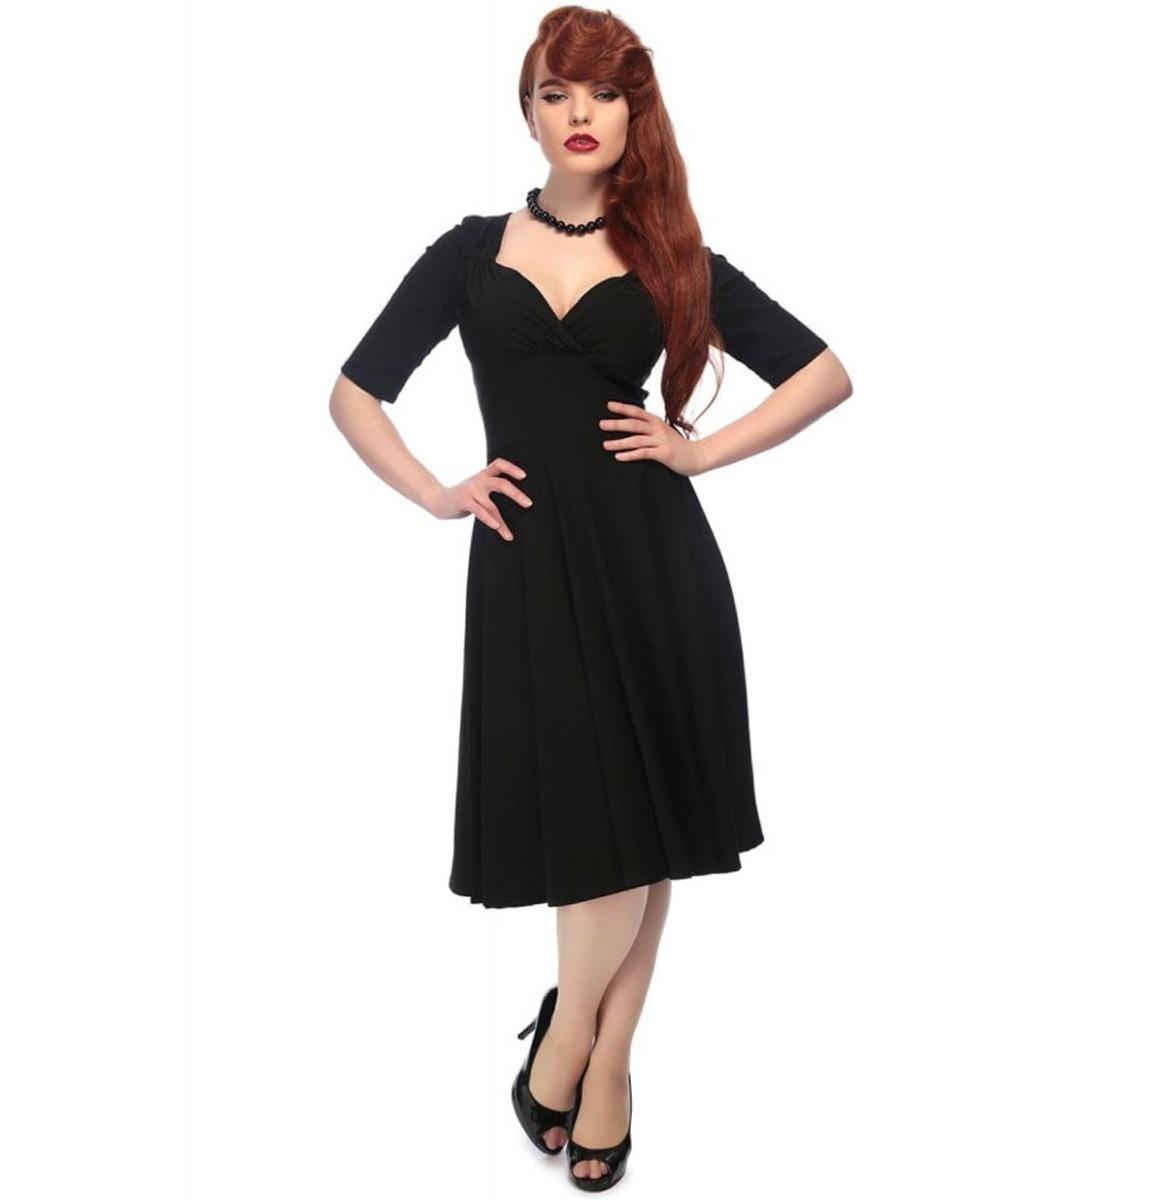 fiftiesstore Trixie Doll Dress Zwart